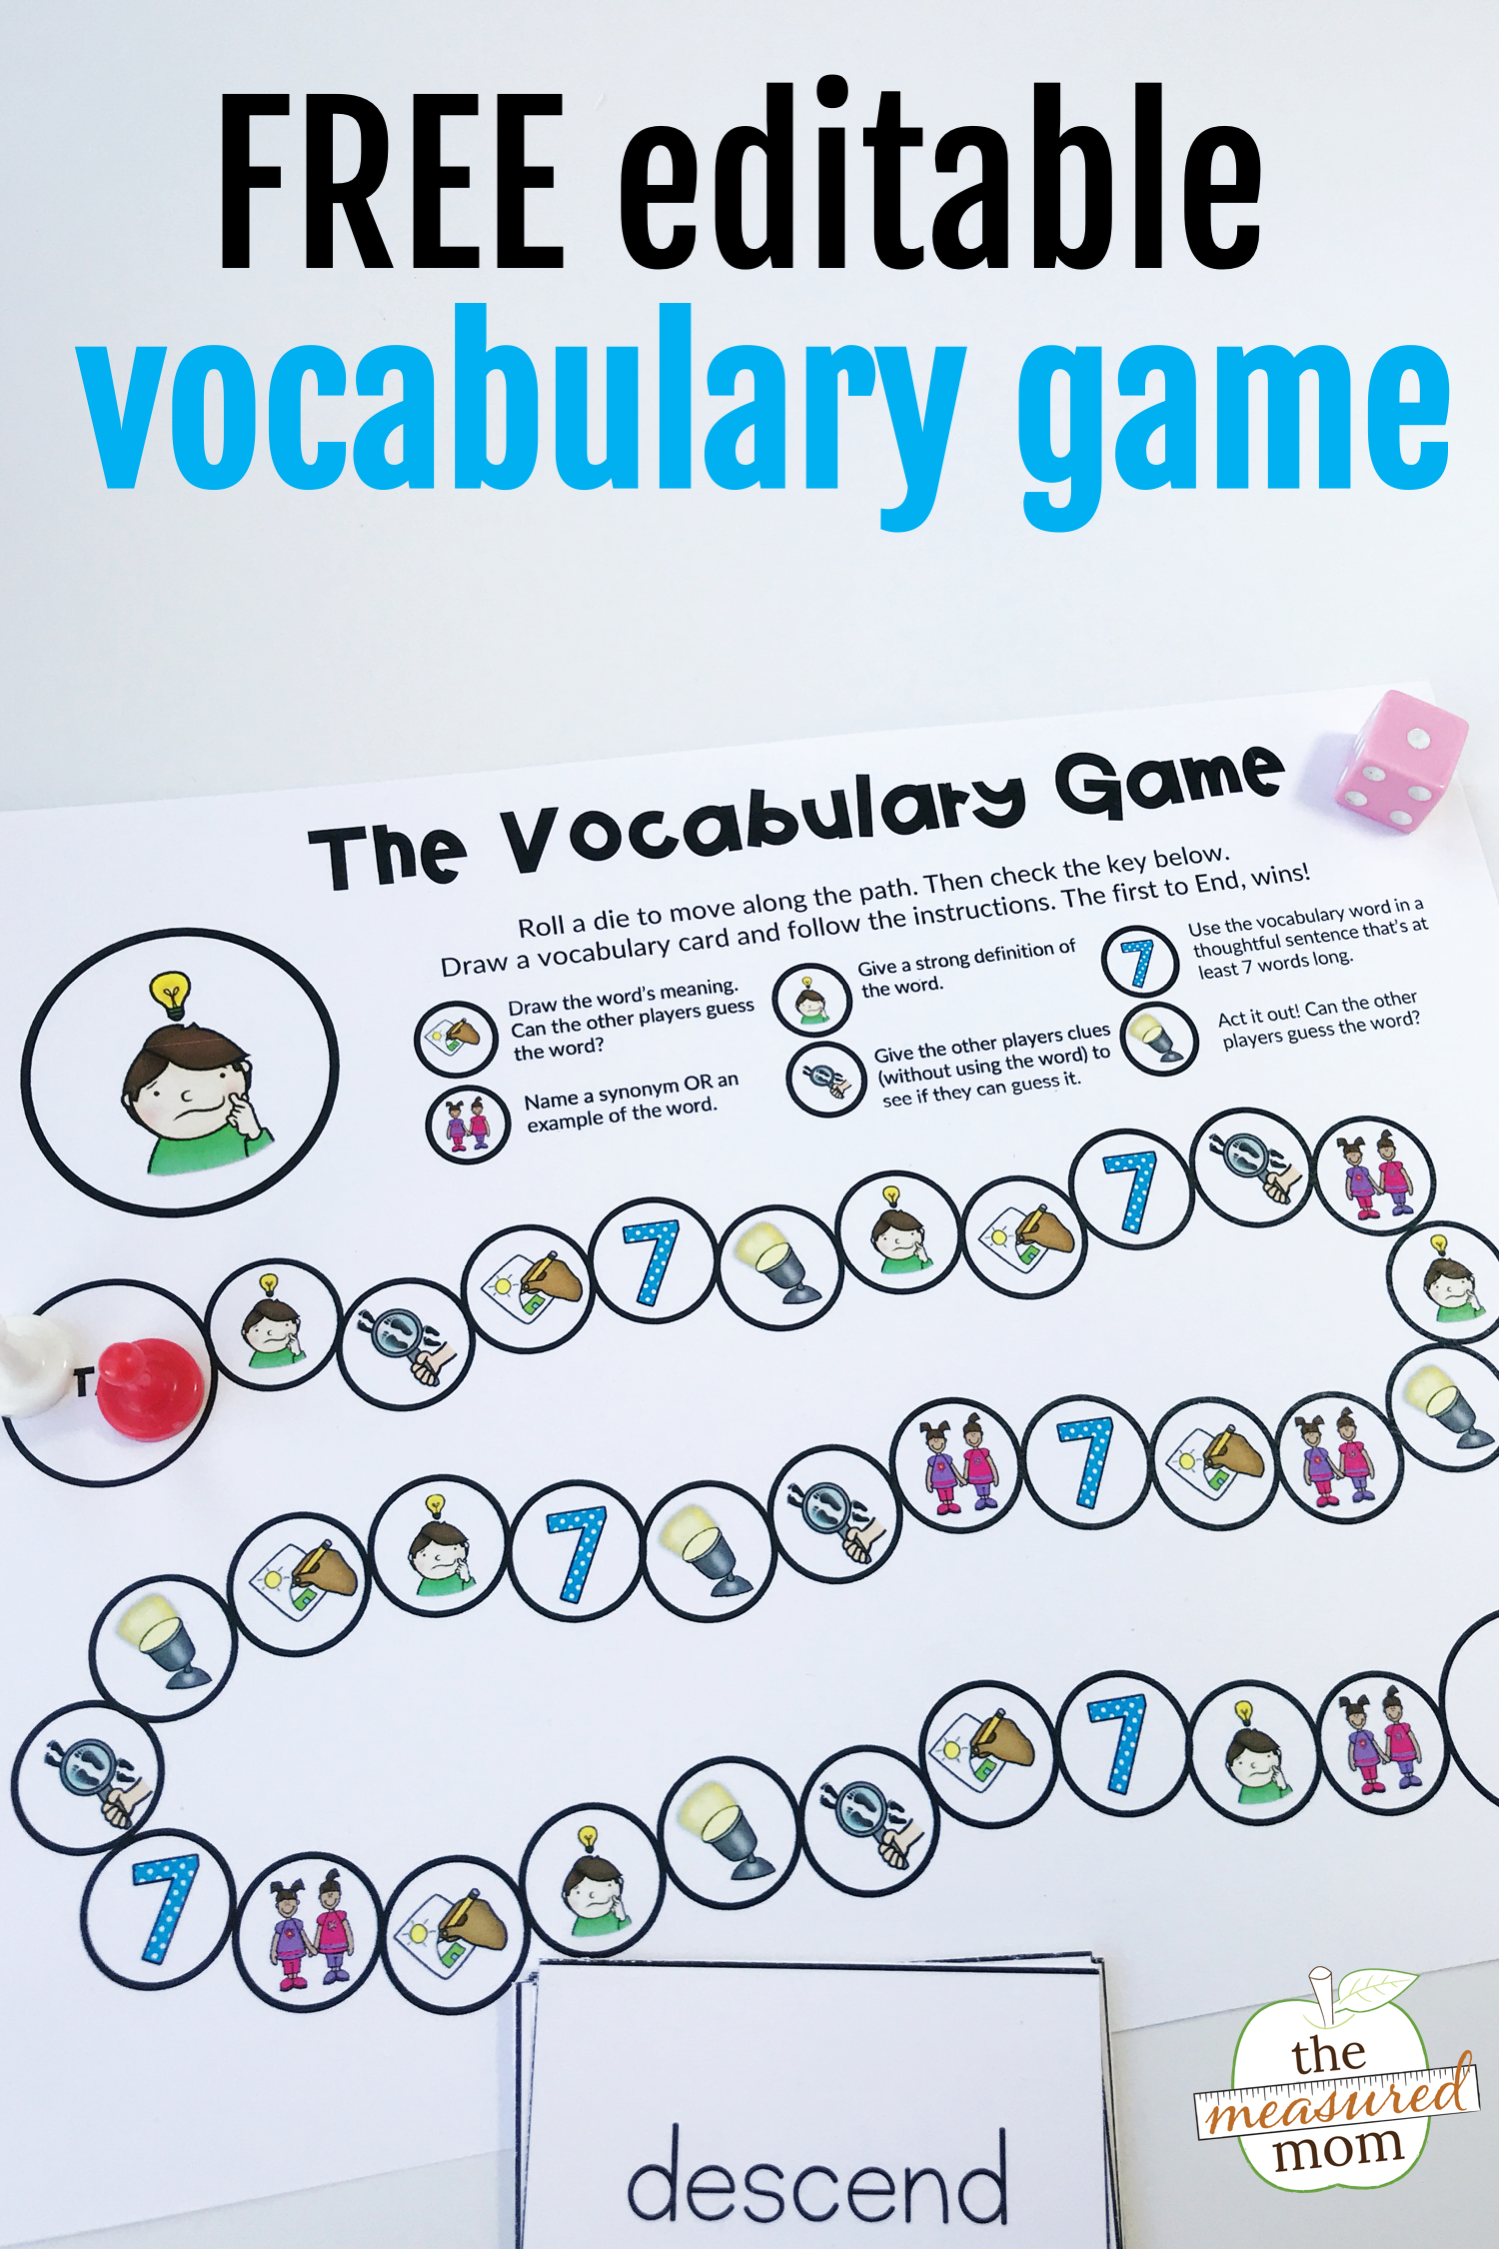 Free printable vocabulary game for grades 35 (editable